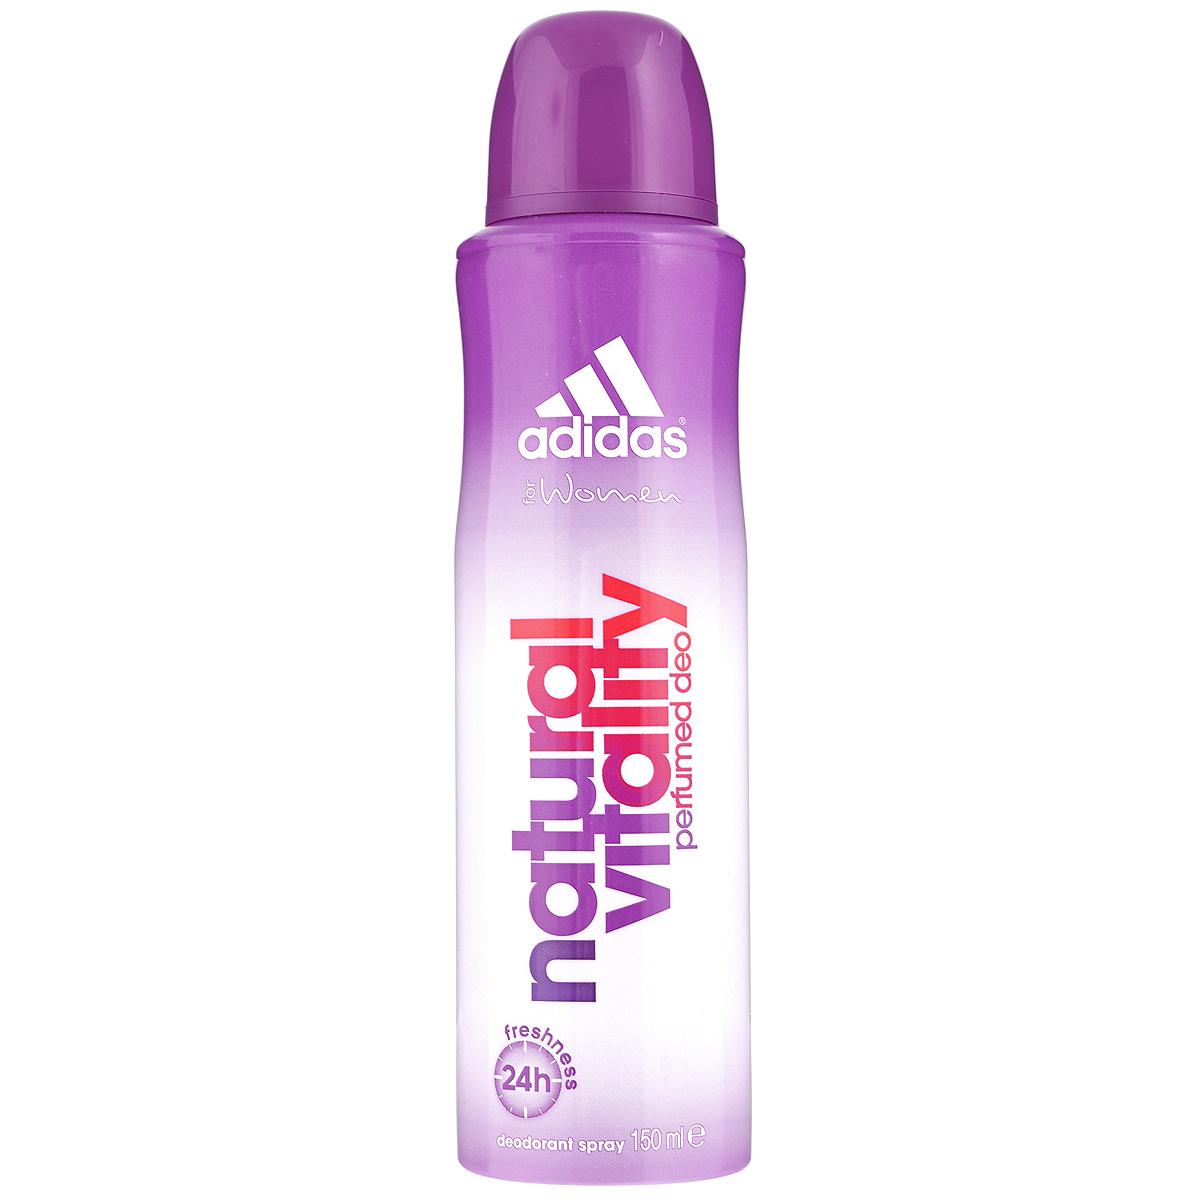 Adidas Дезодорант-спрей Natural Vitality, женский, 150 мл adidas 6in1 дезодорант антиперспирант спрей 6 в 1 для женщин 150 мл